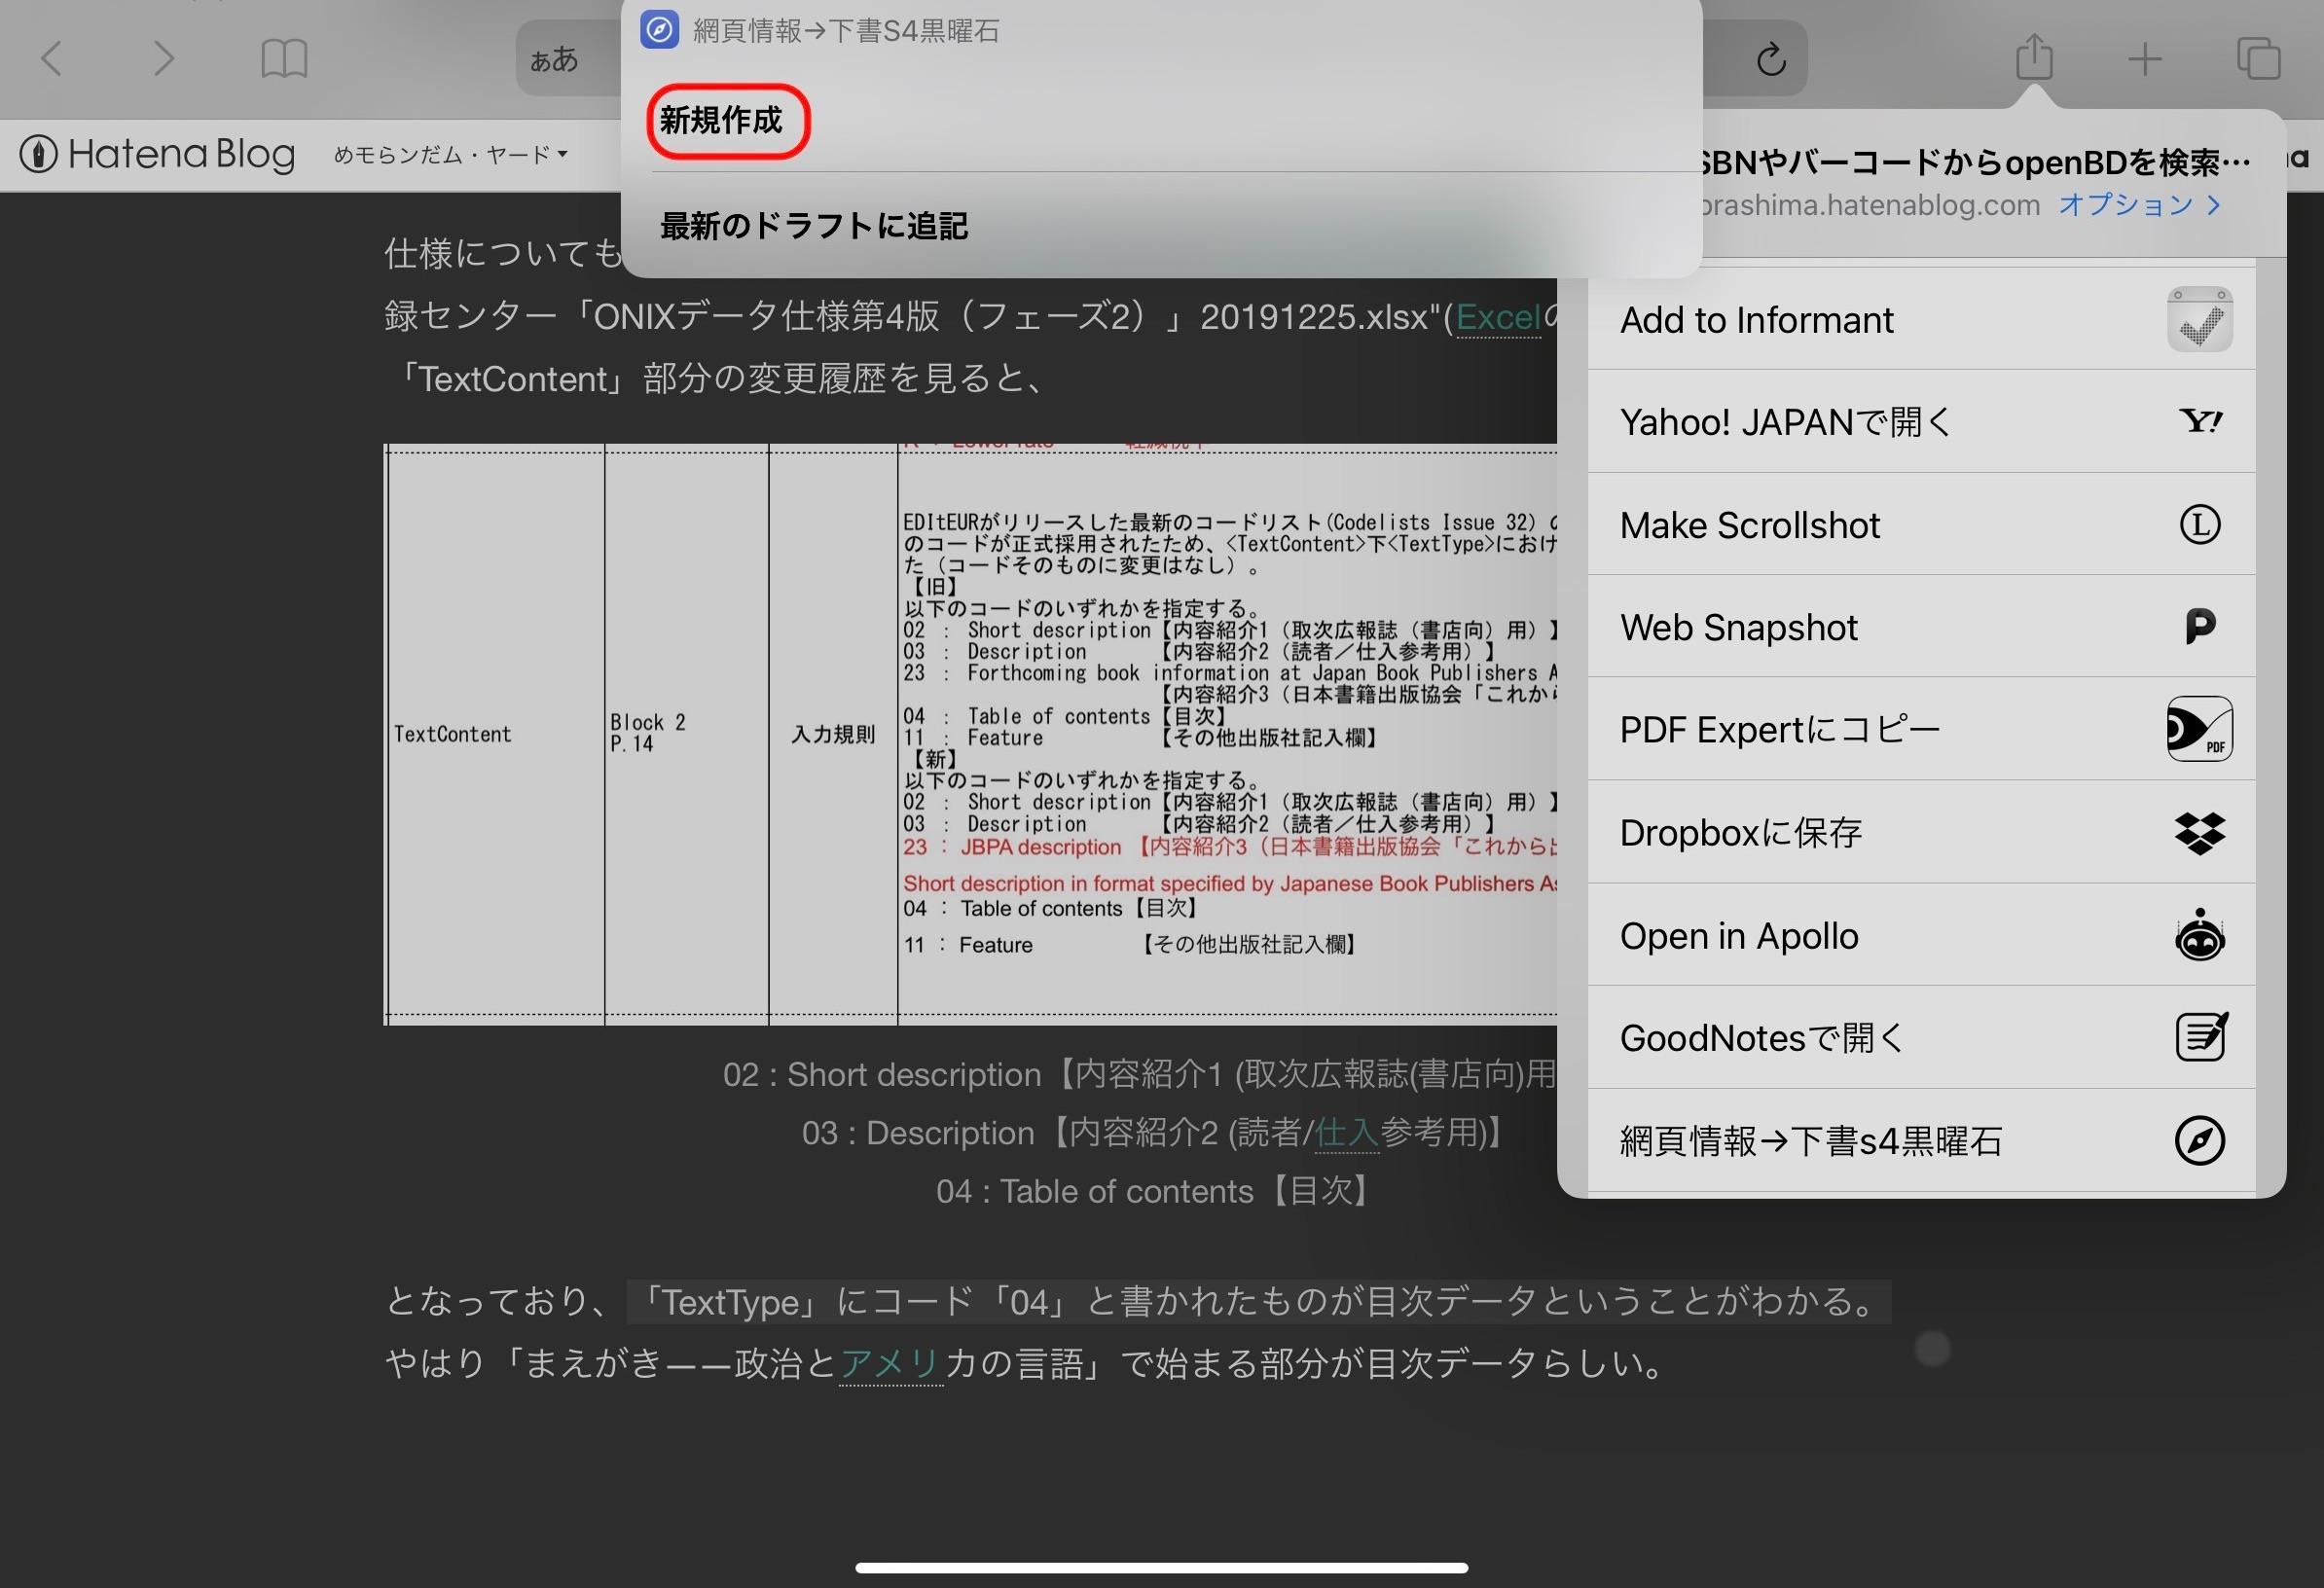 f:id:sorashima:20210702192313j:plain:w990